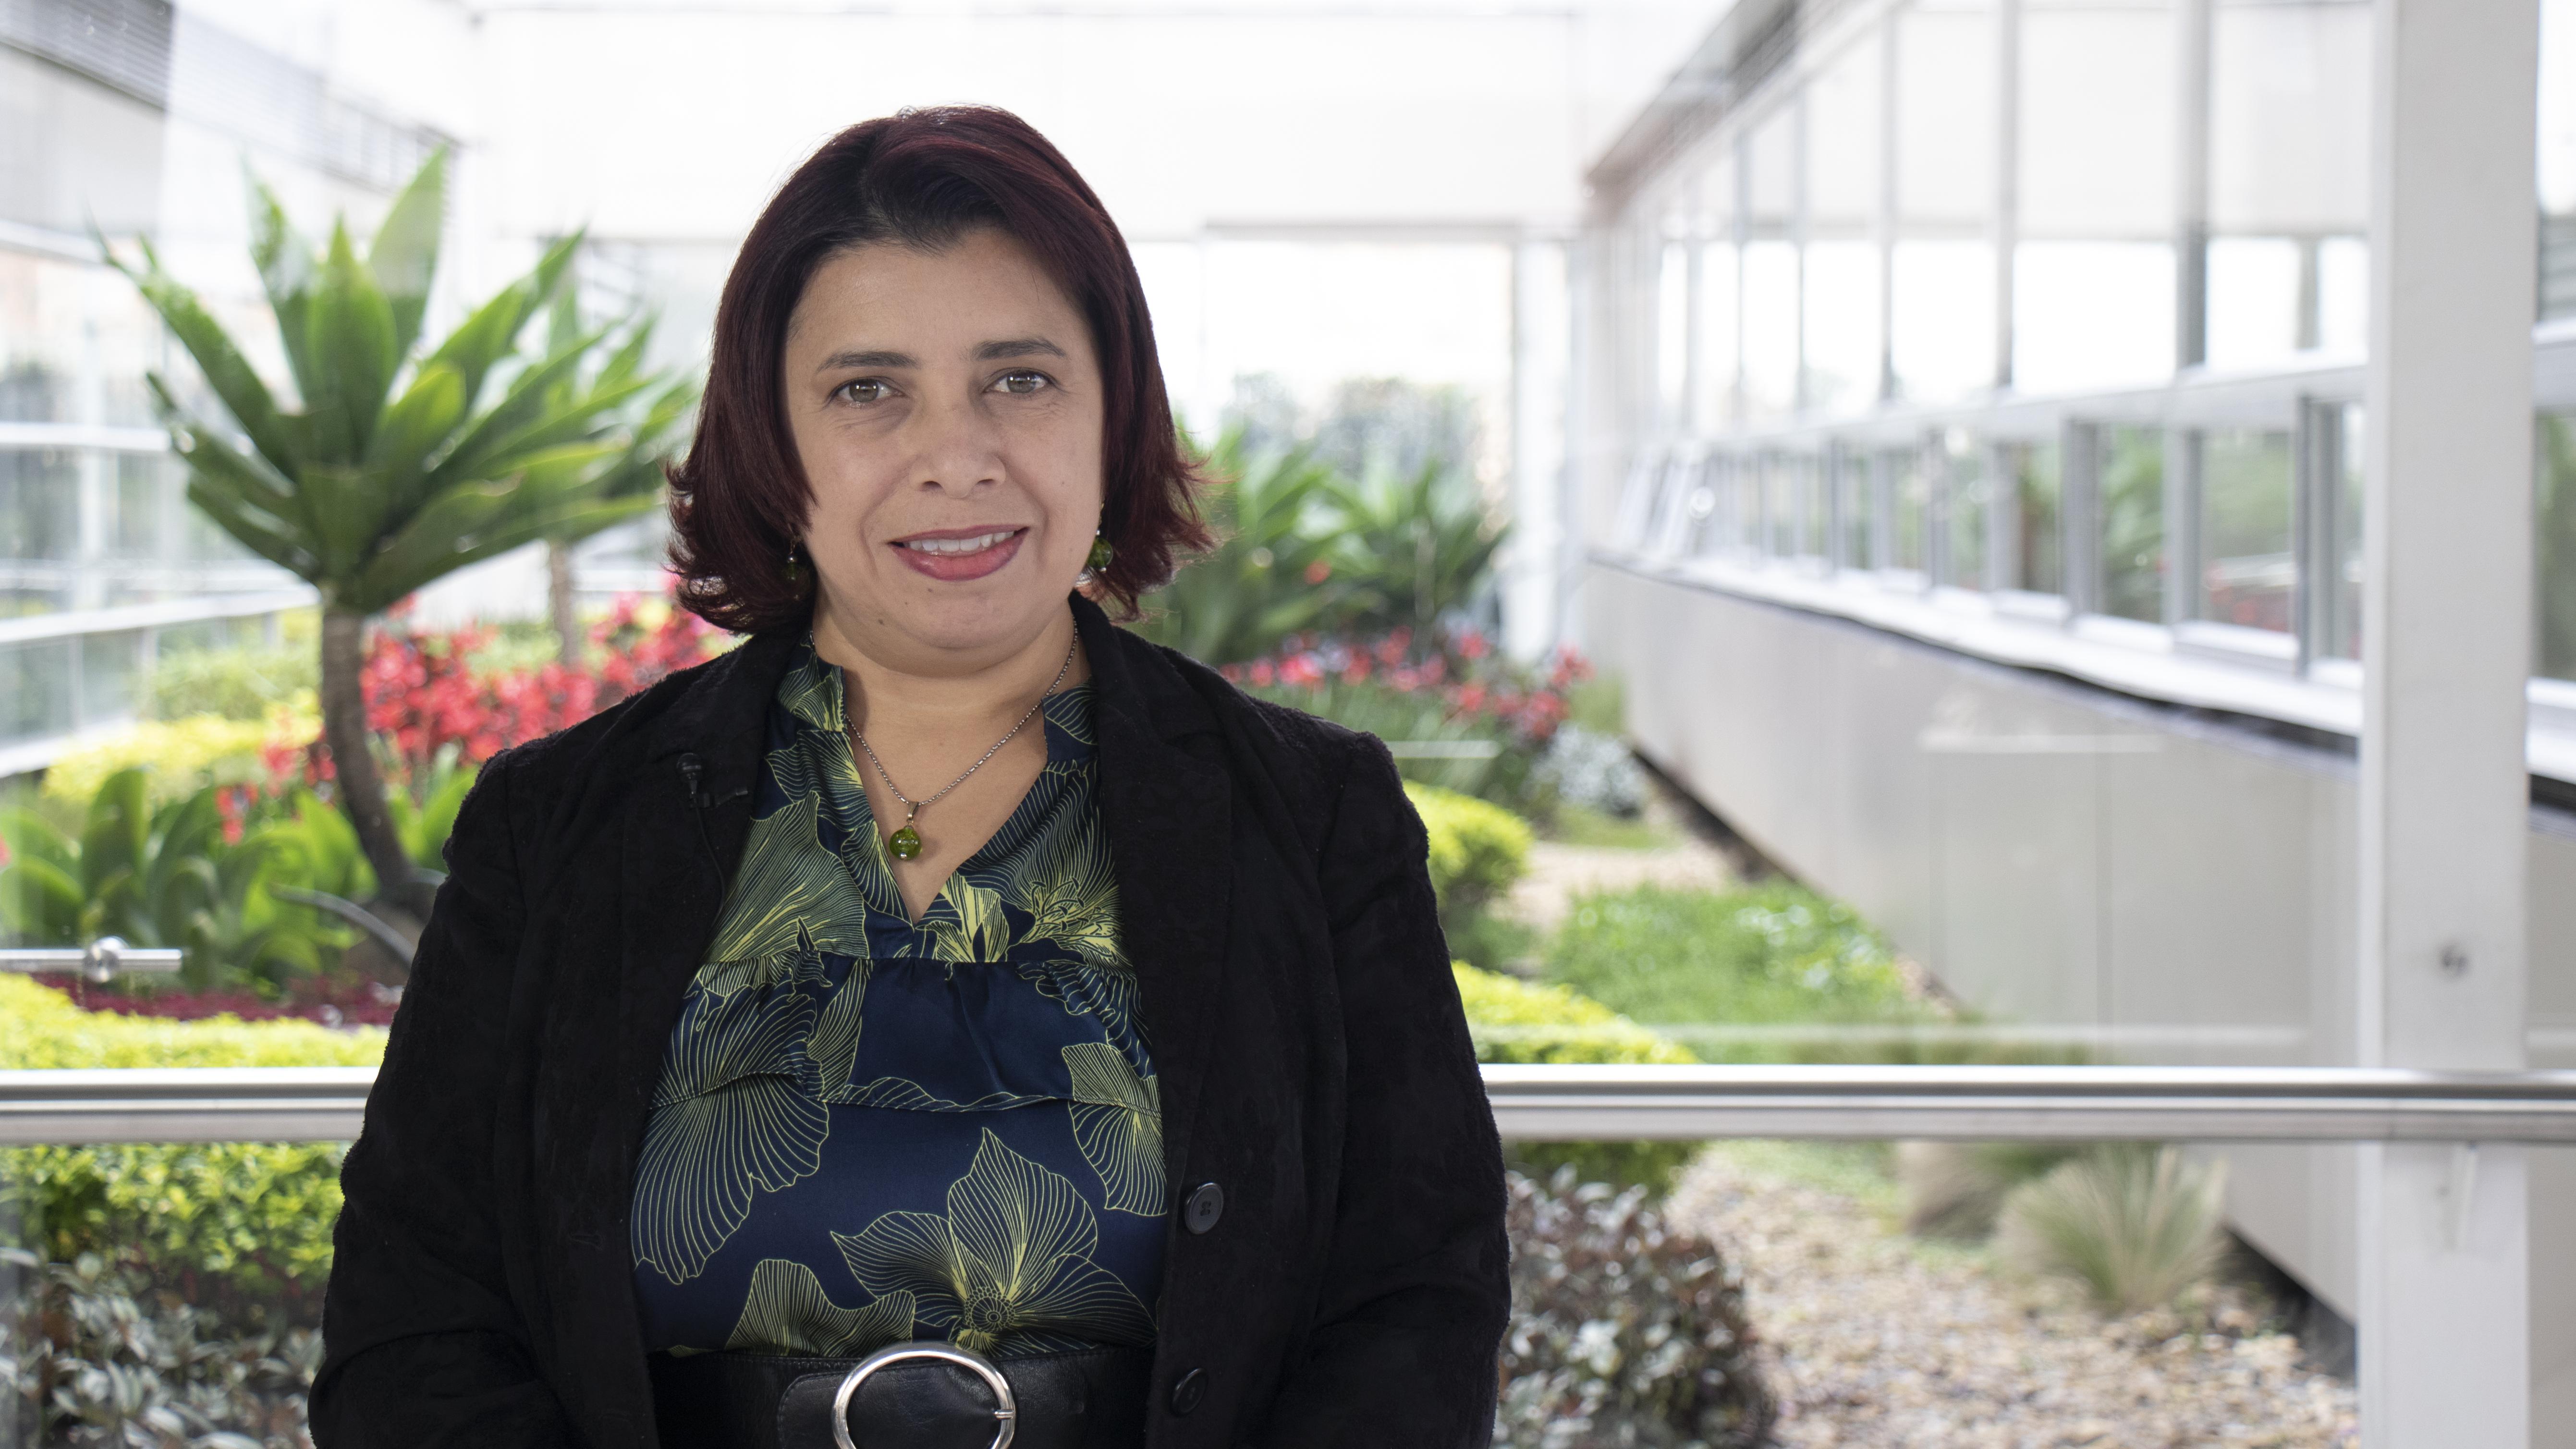 Claudia Mercedes Padrón Mercado